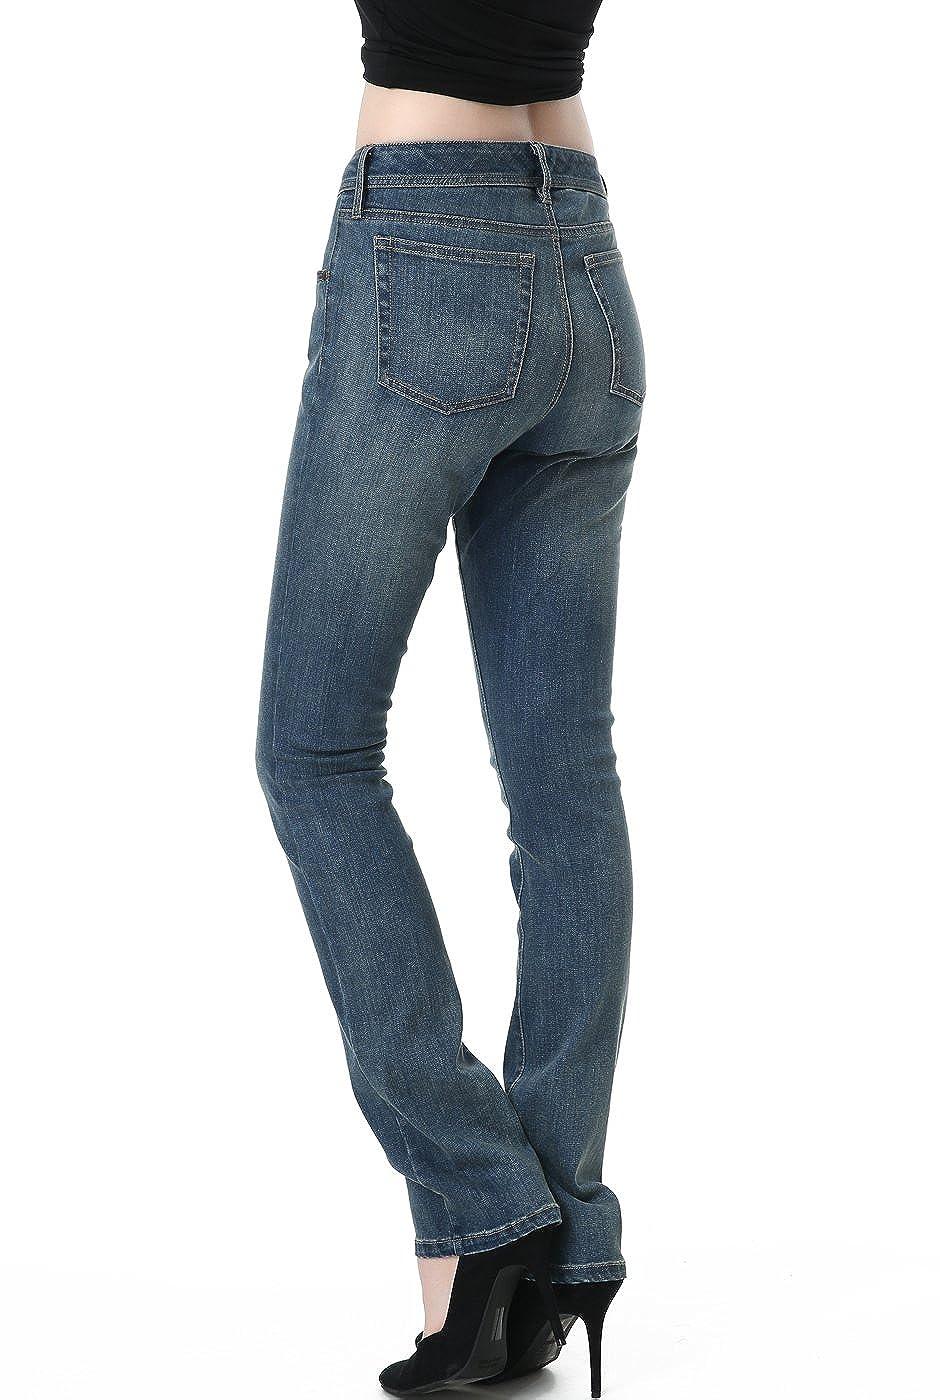 phistic Womens Ultra Stretch Medium Indigo Straight Leg Jeans